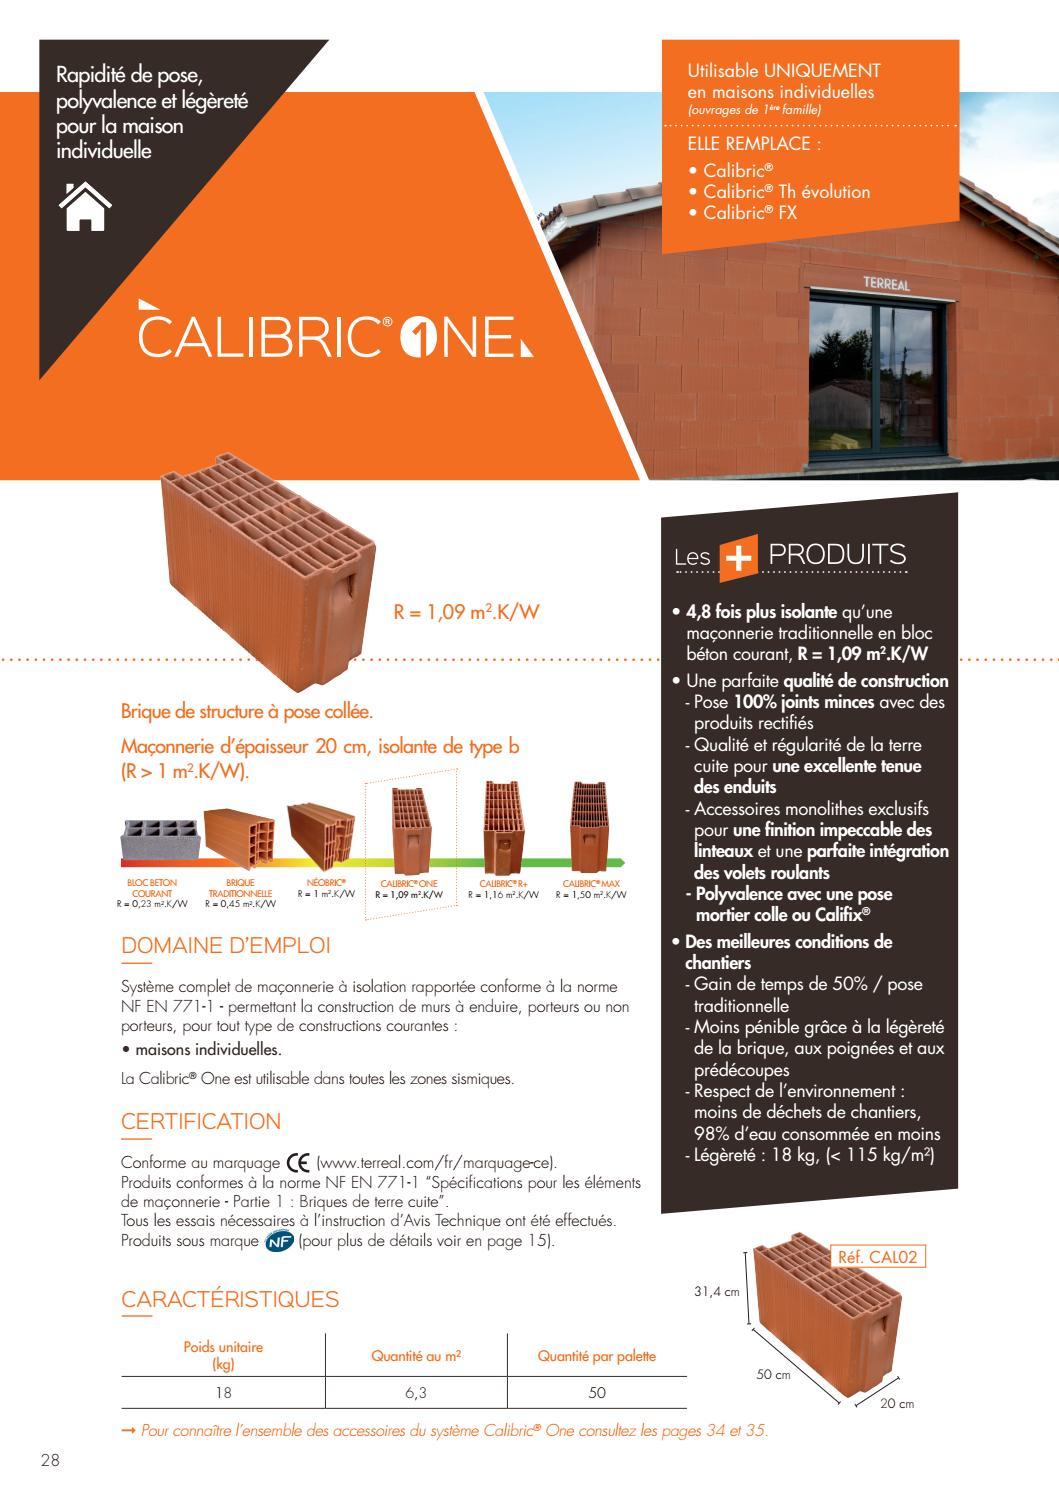 calibric-one-r-max by BigMatFrance - issuu